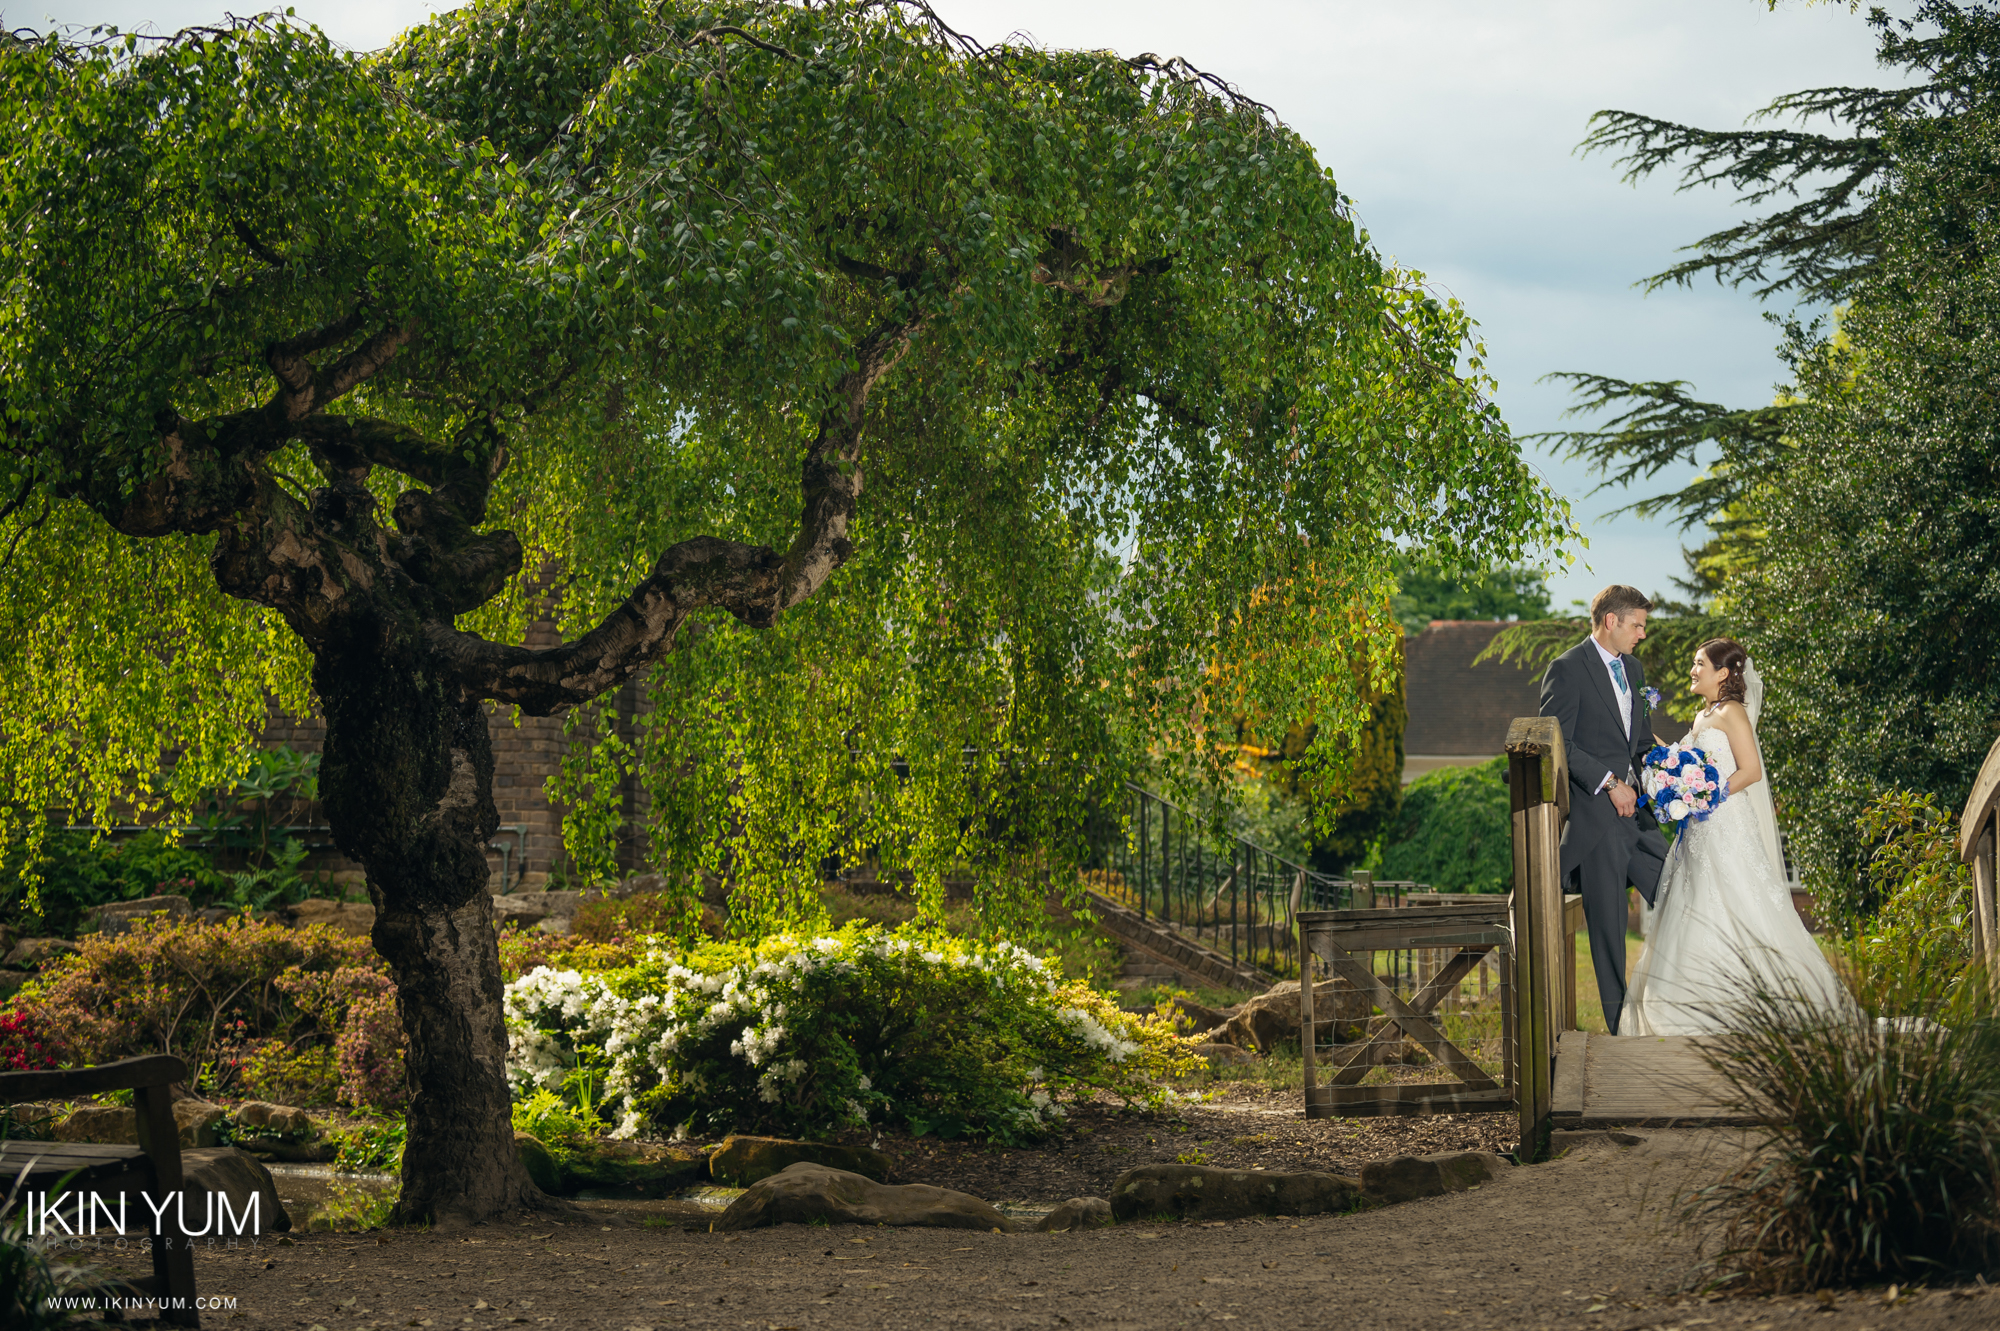 Sacred Heart Wimbledon Wedding - See More